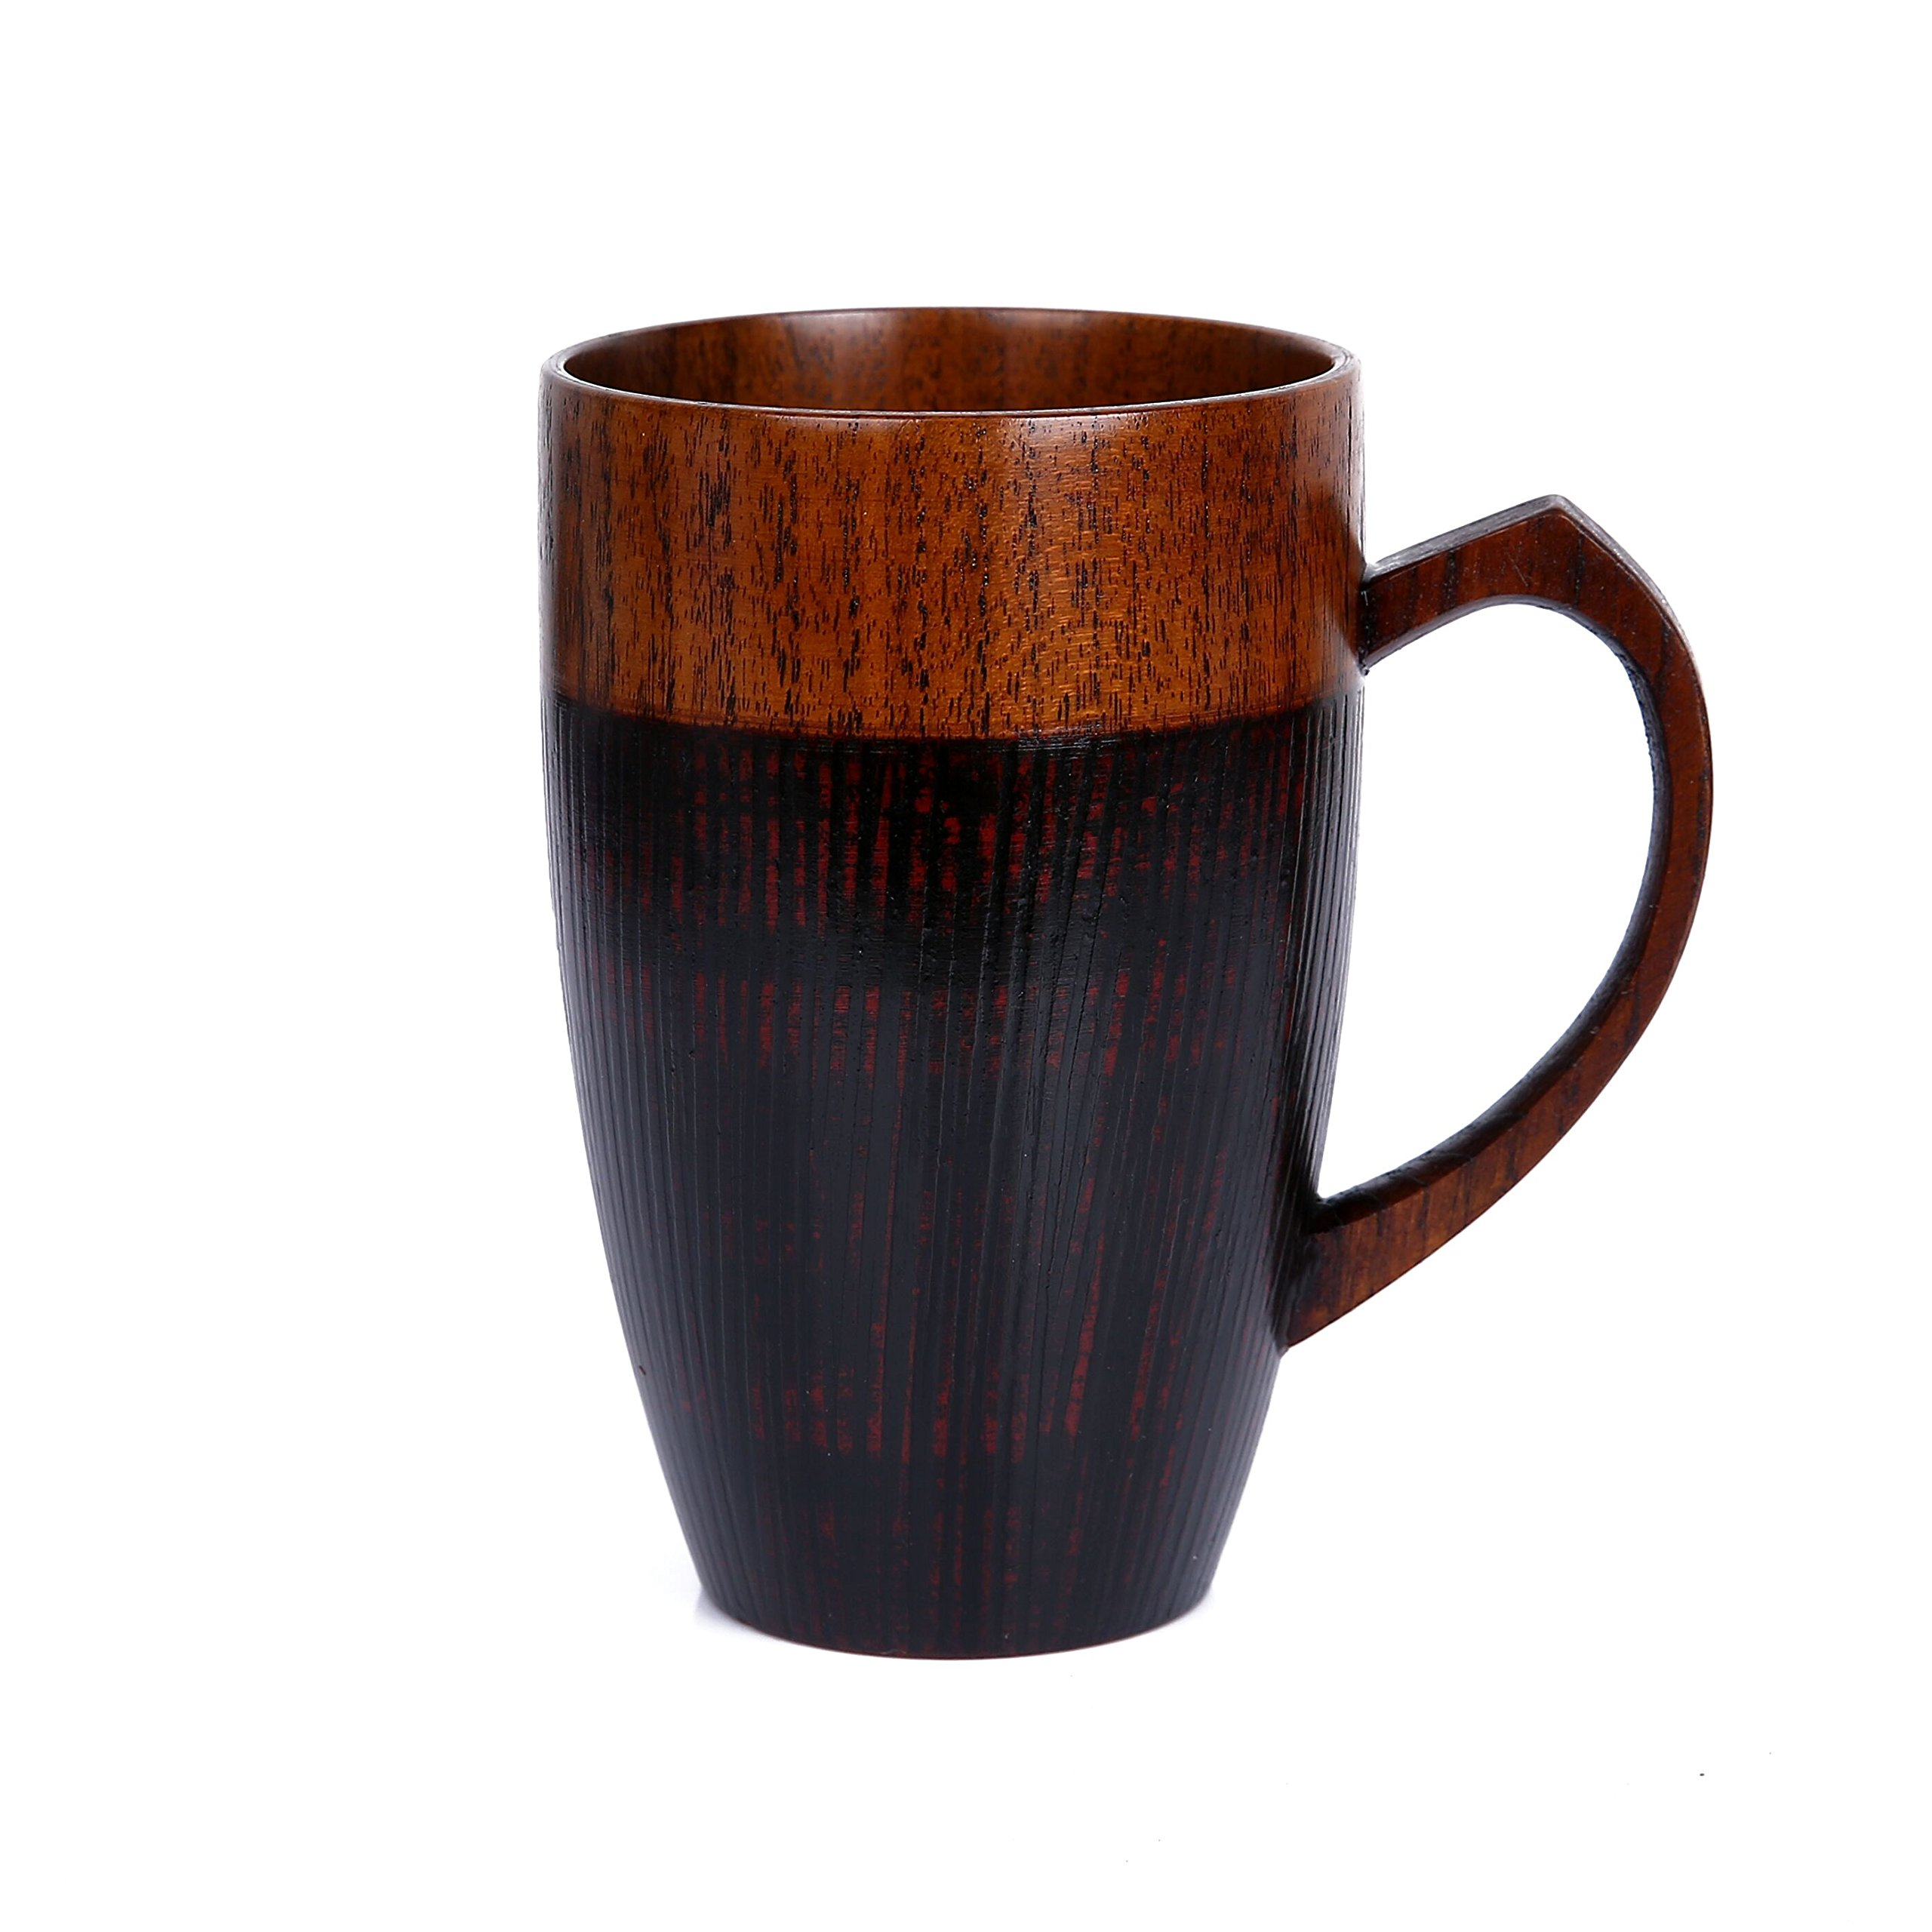 WOOD MEETS COLOR Mug Cup Handmade Wood with Heart Handle(Black 10 OZ)